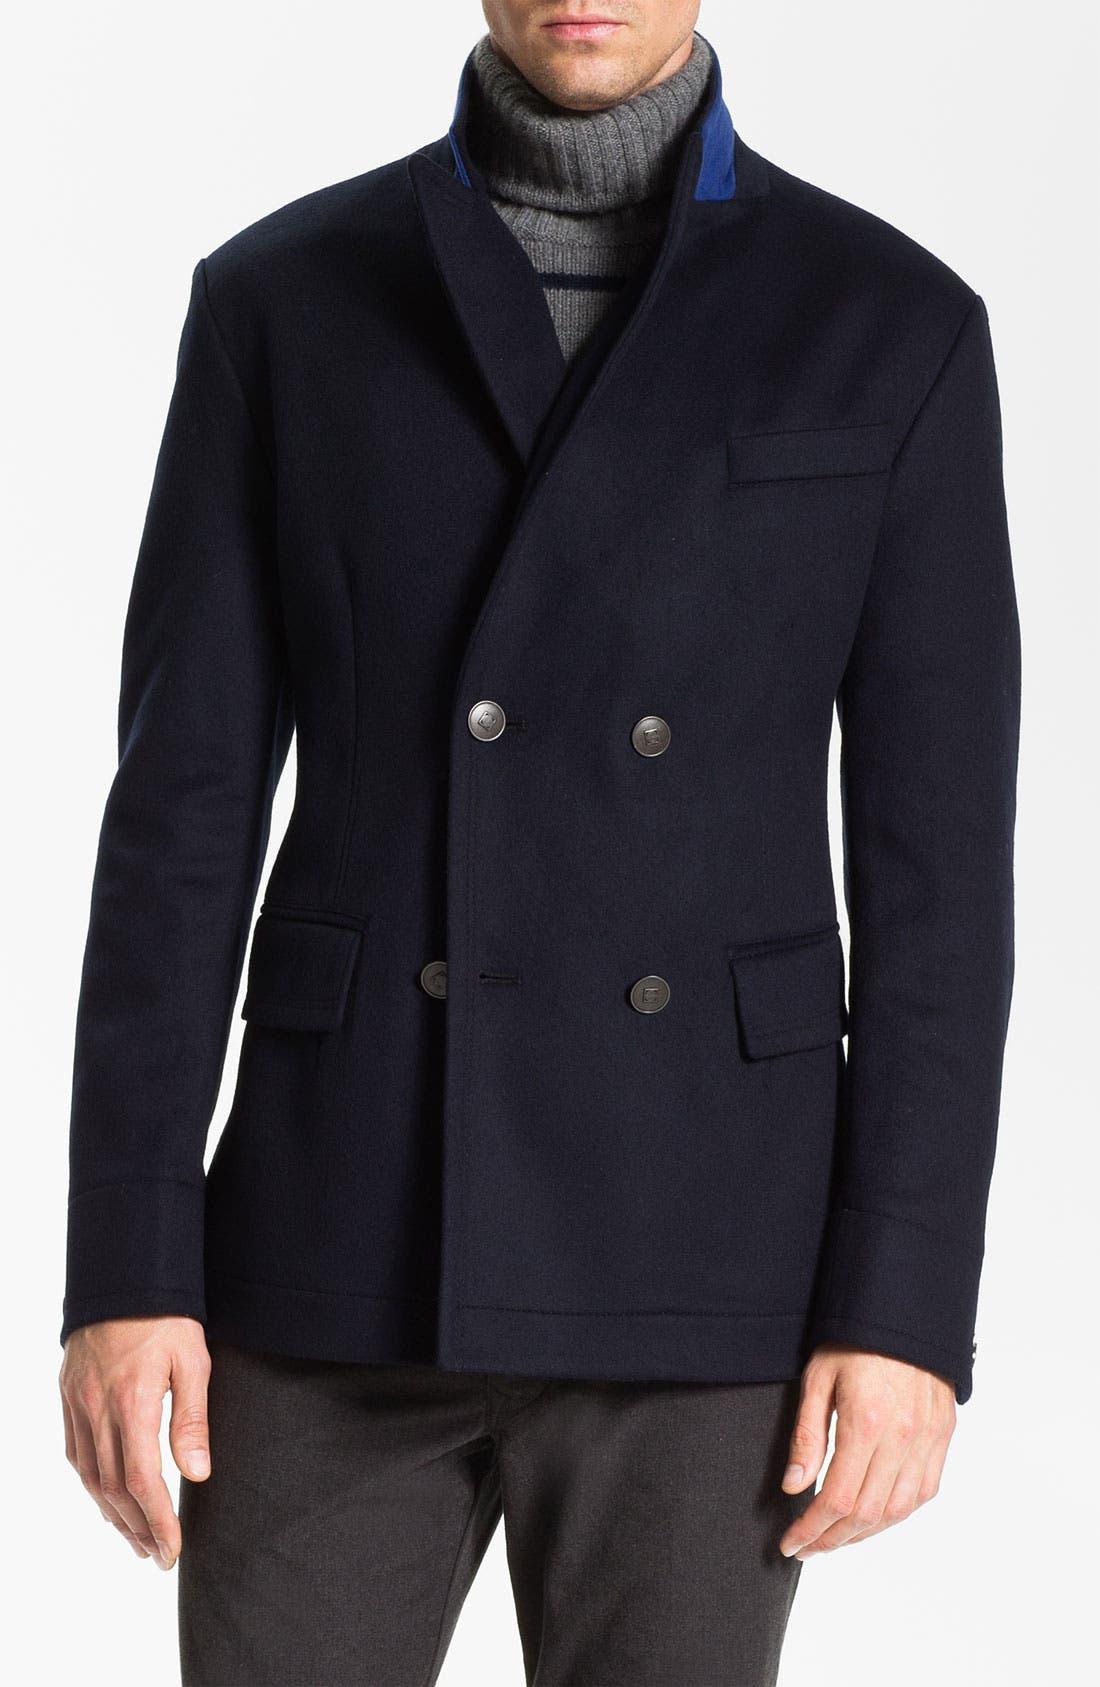 Alternate Image 1 Selected - BOSS Black 'Clynt' Wool & Cashmere Blend Jacket